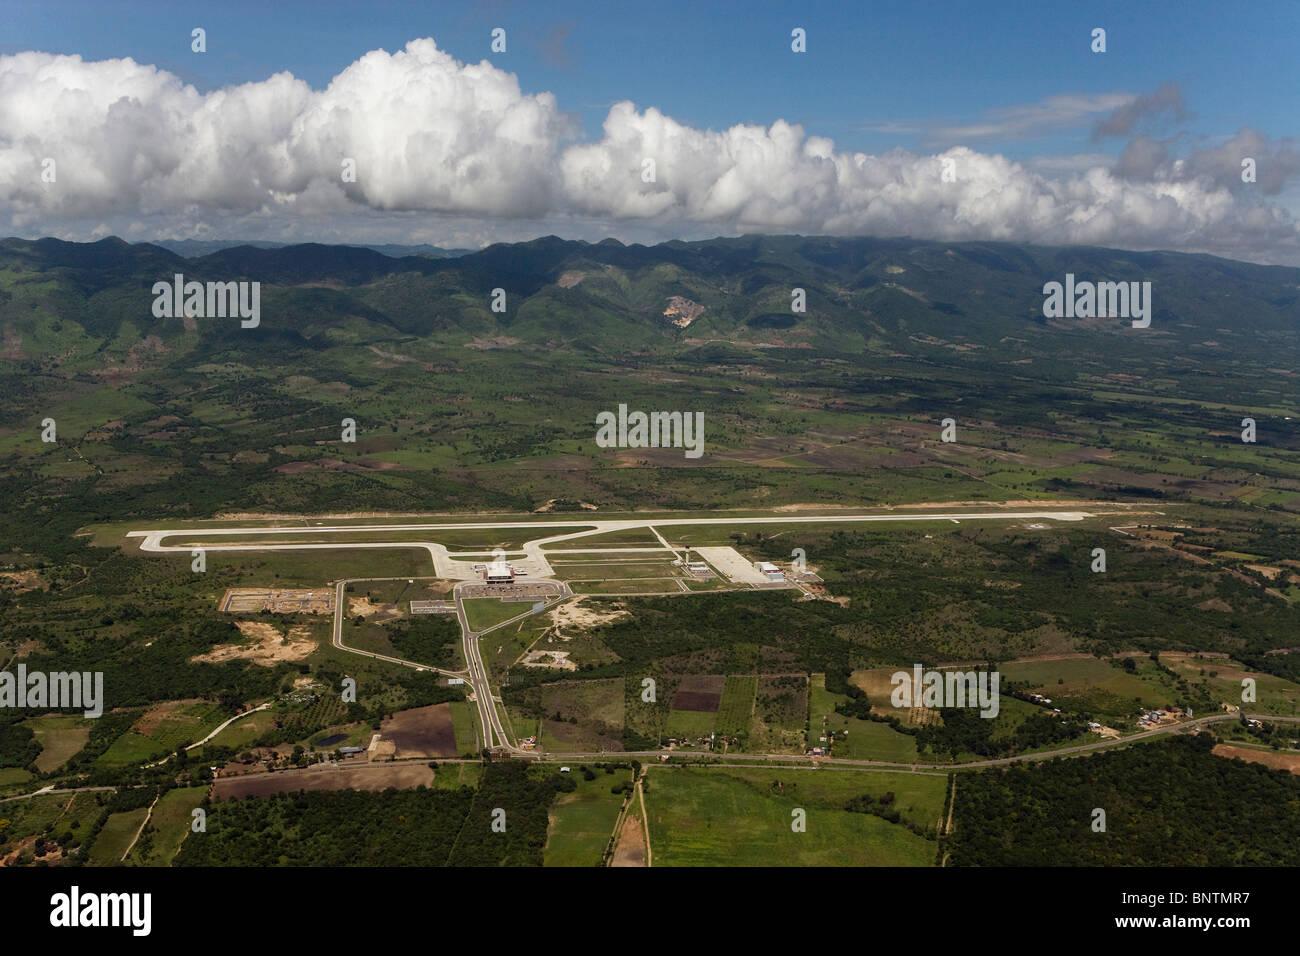 aerial view above Tuxtla Gutierrez airport Chiapas Mexico - Stock Image